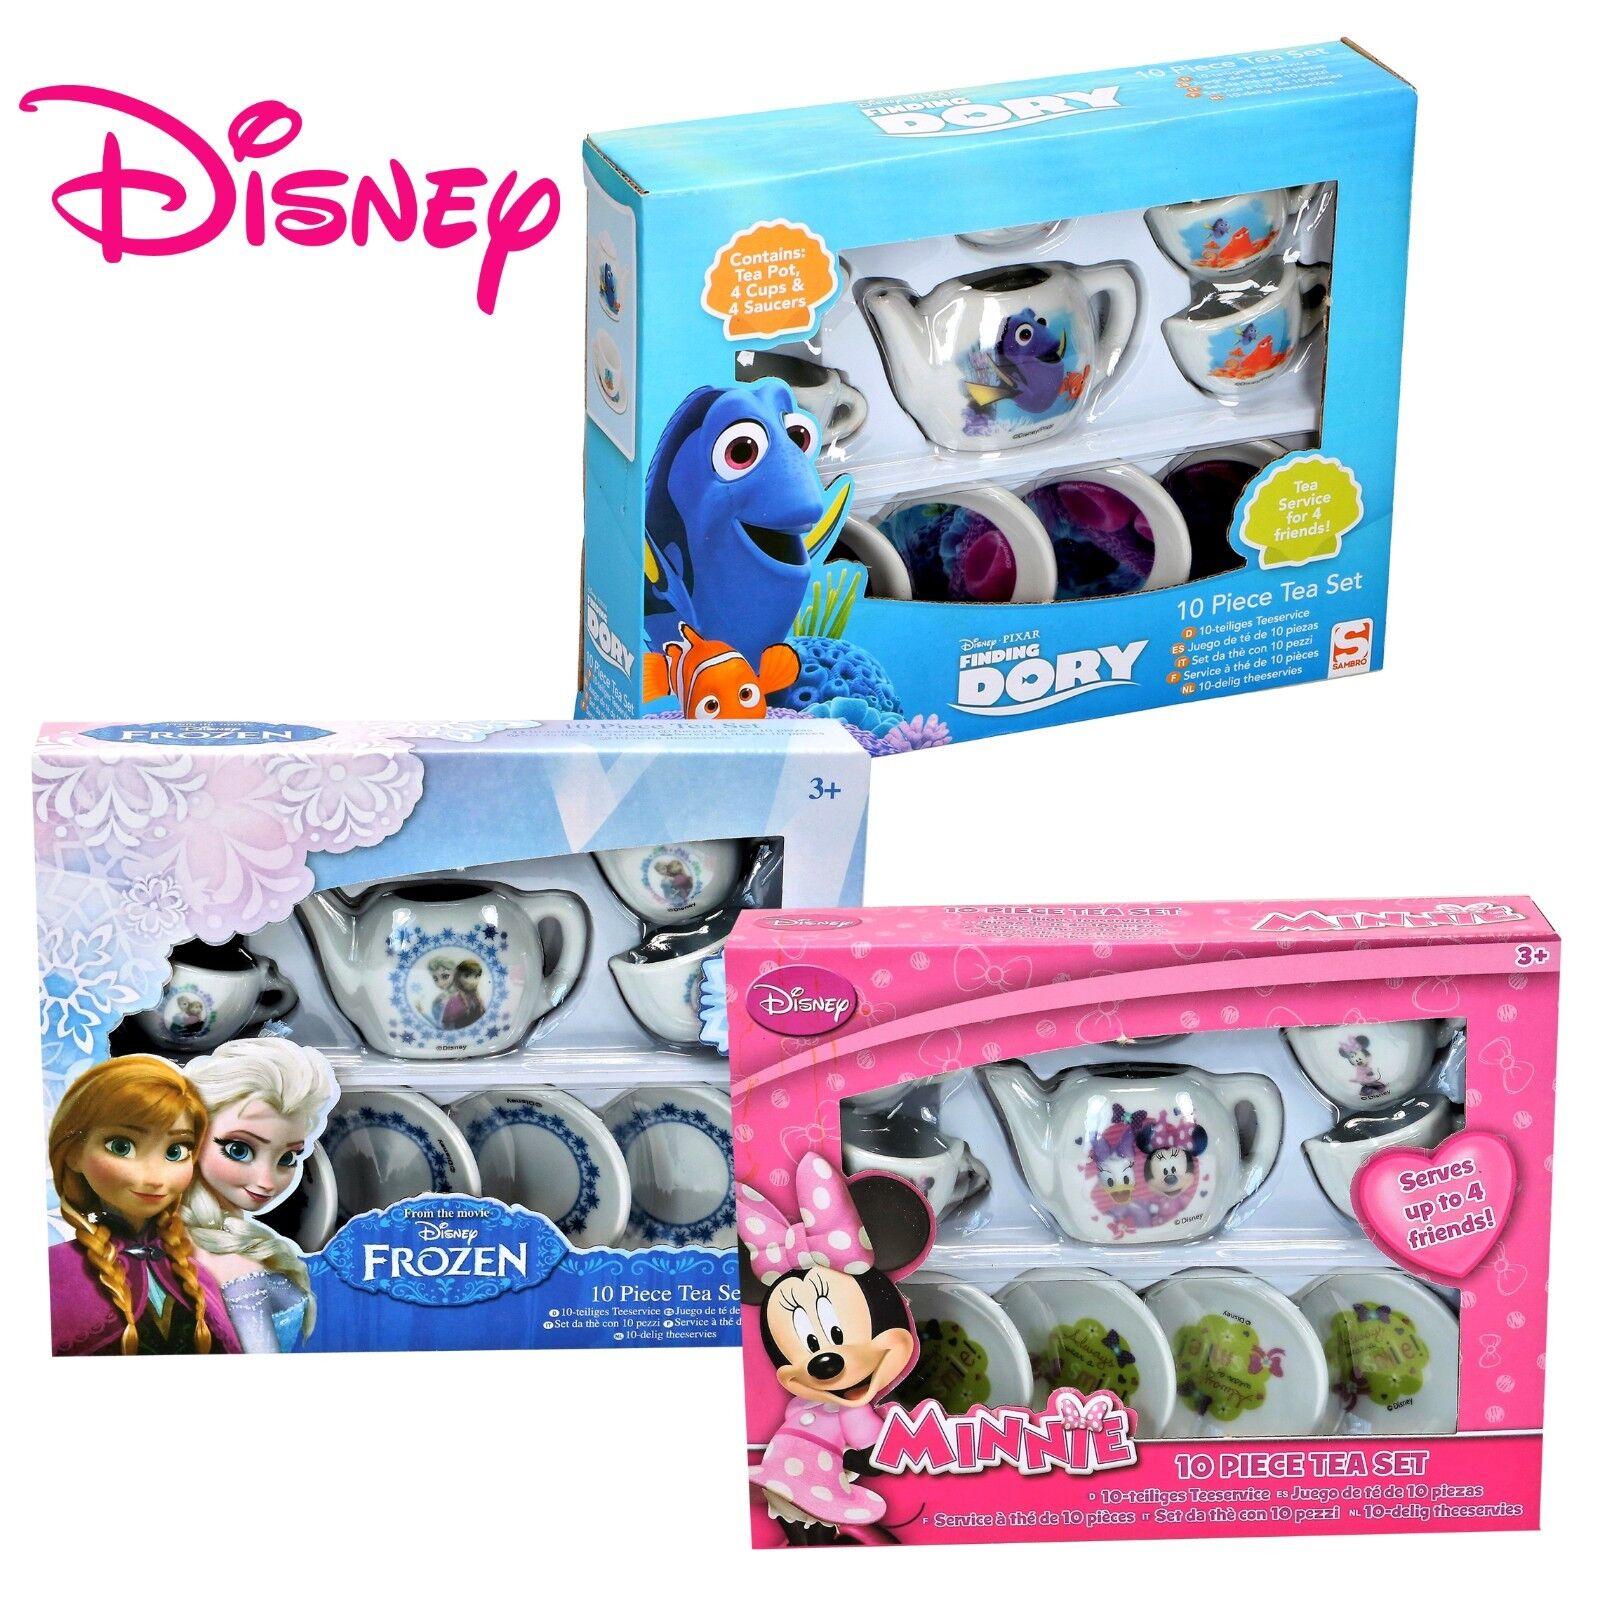 Disney 10-tlg Kinder Porzellan Teeservice Teeset Findet Dory Minnie Mouse Frozen